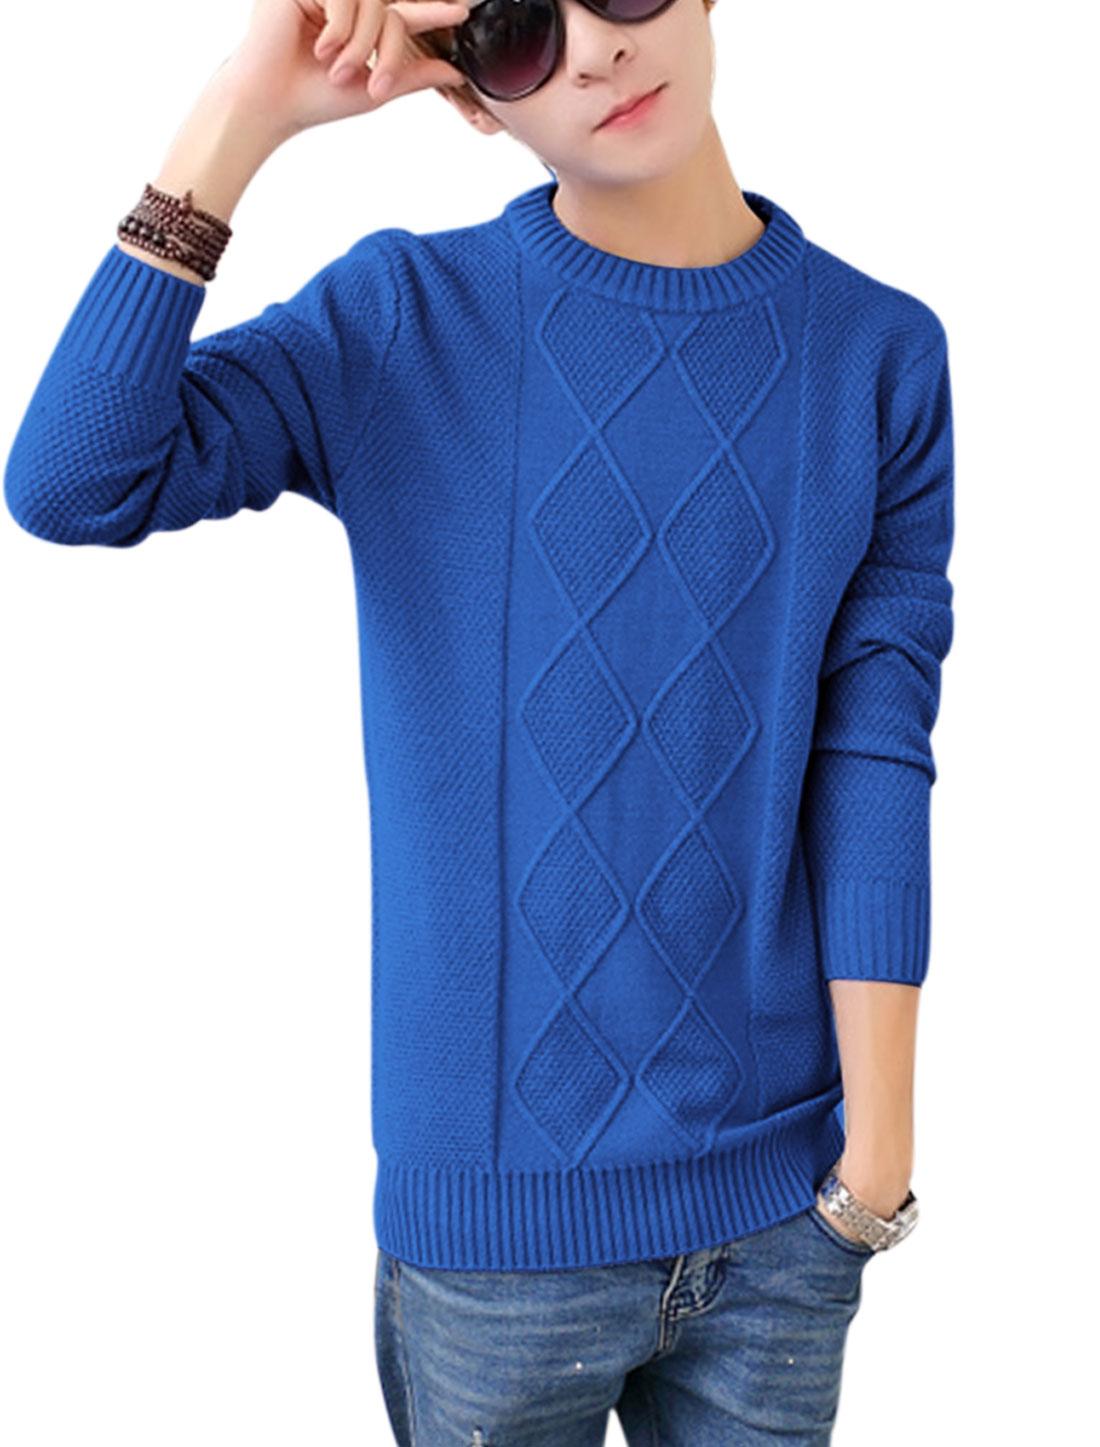 Crew Neck Slipover Fashion Design Royal BlueSweater for Man S